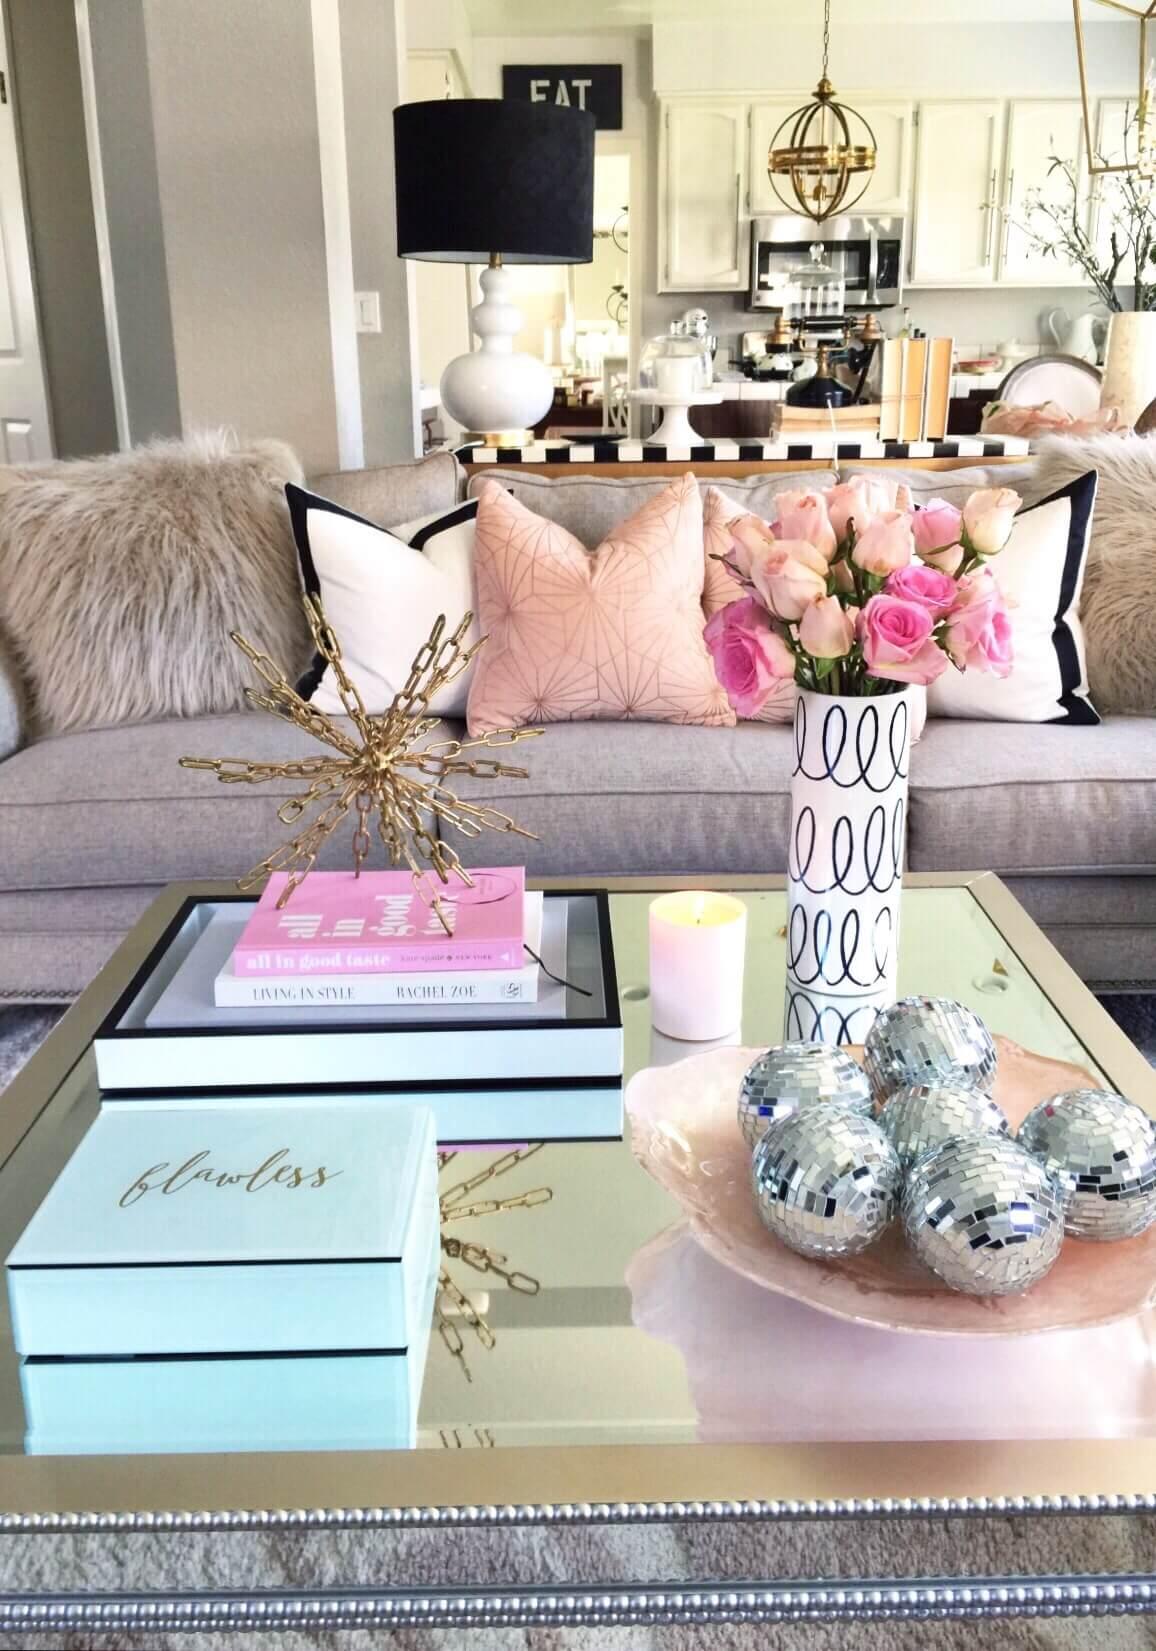 Table miroir glamour avec art d'accent métallique